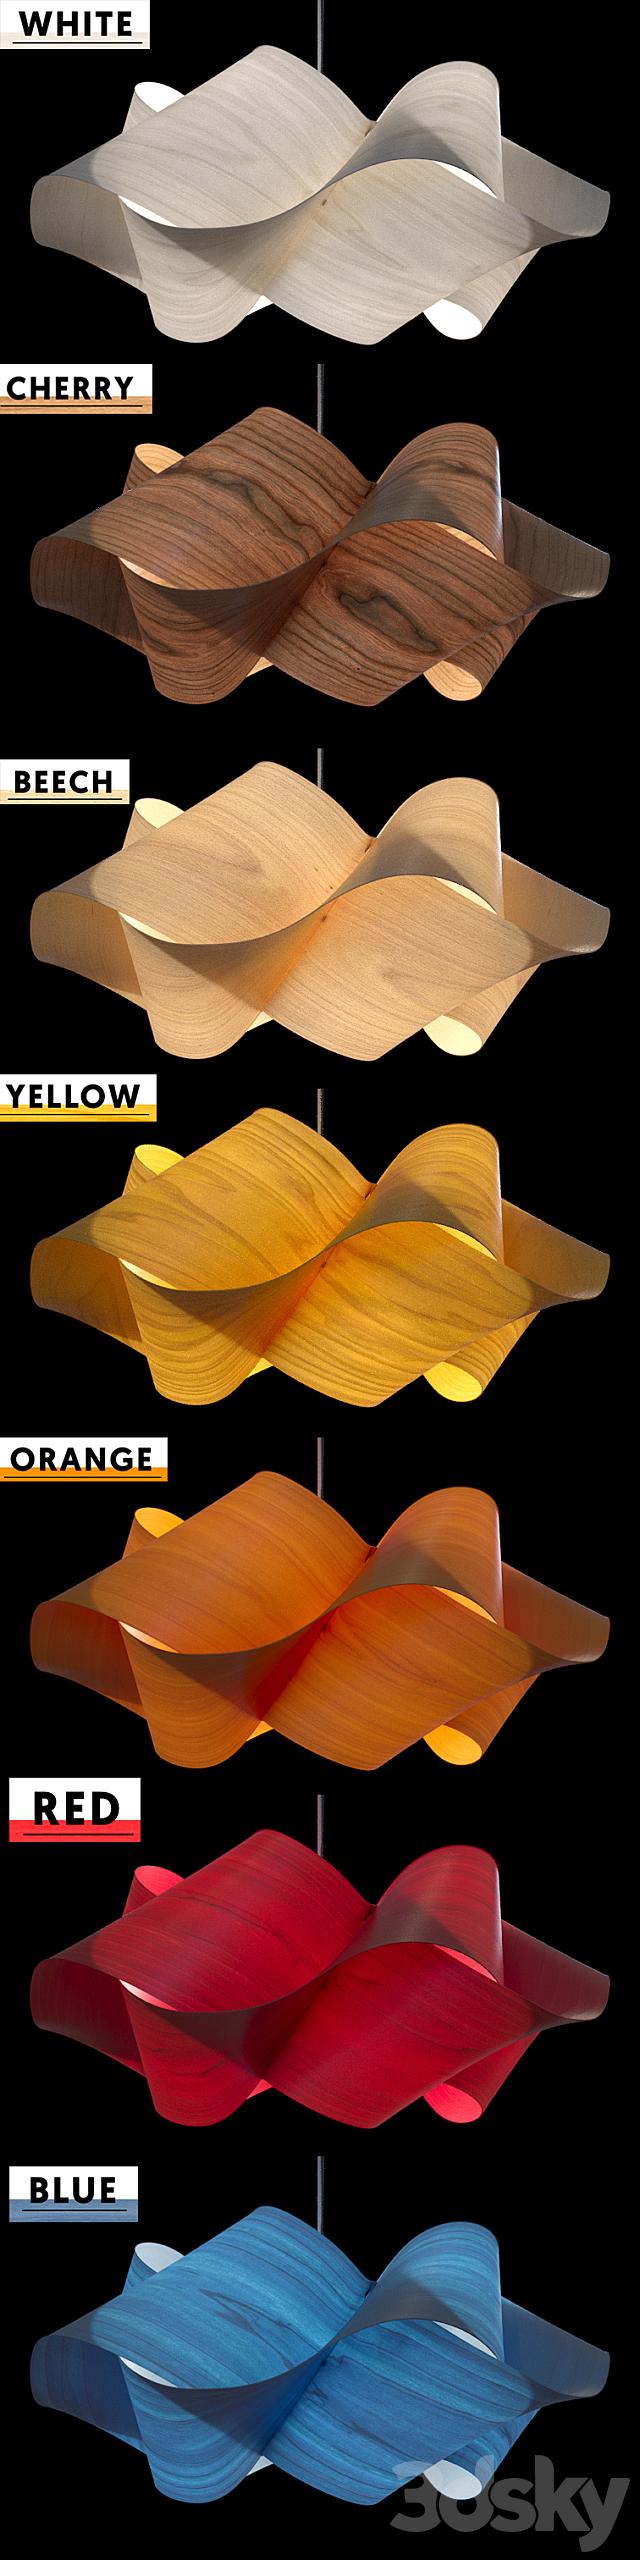 LZF - SWIRL ceiling light